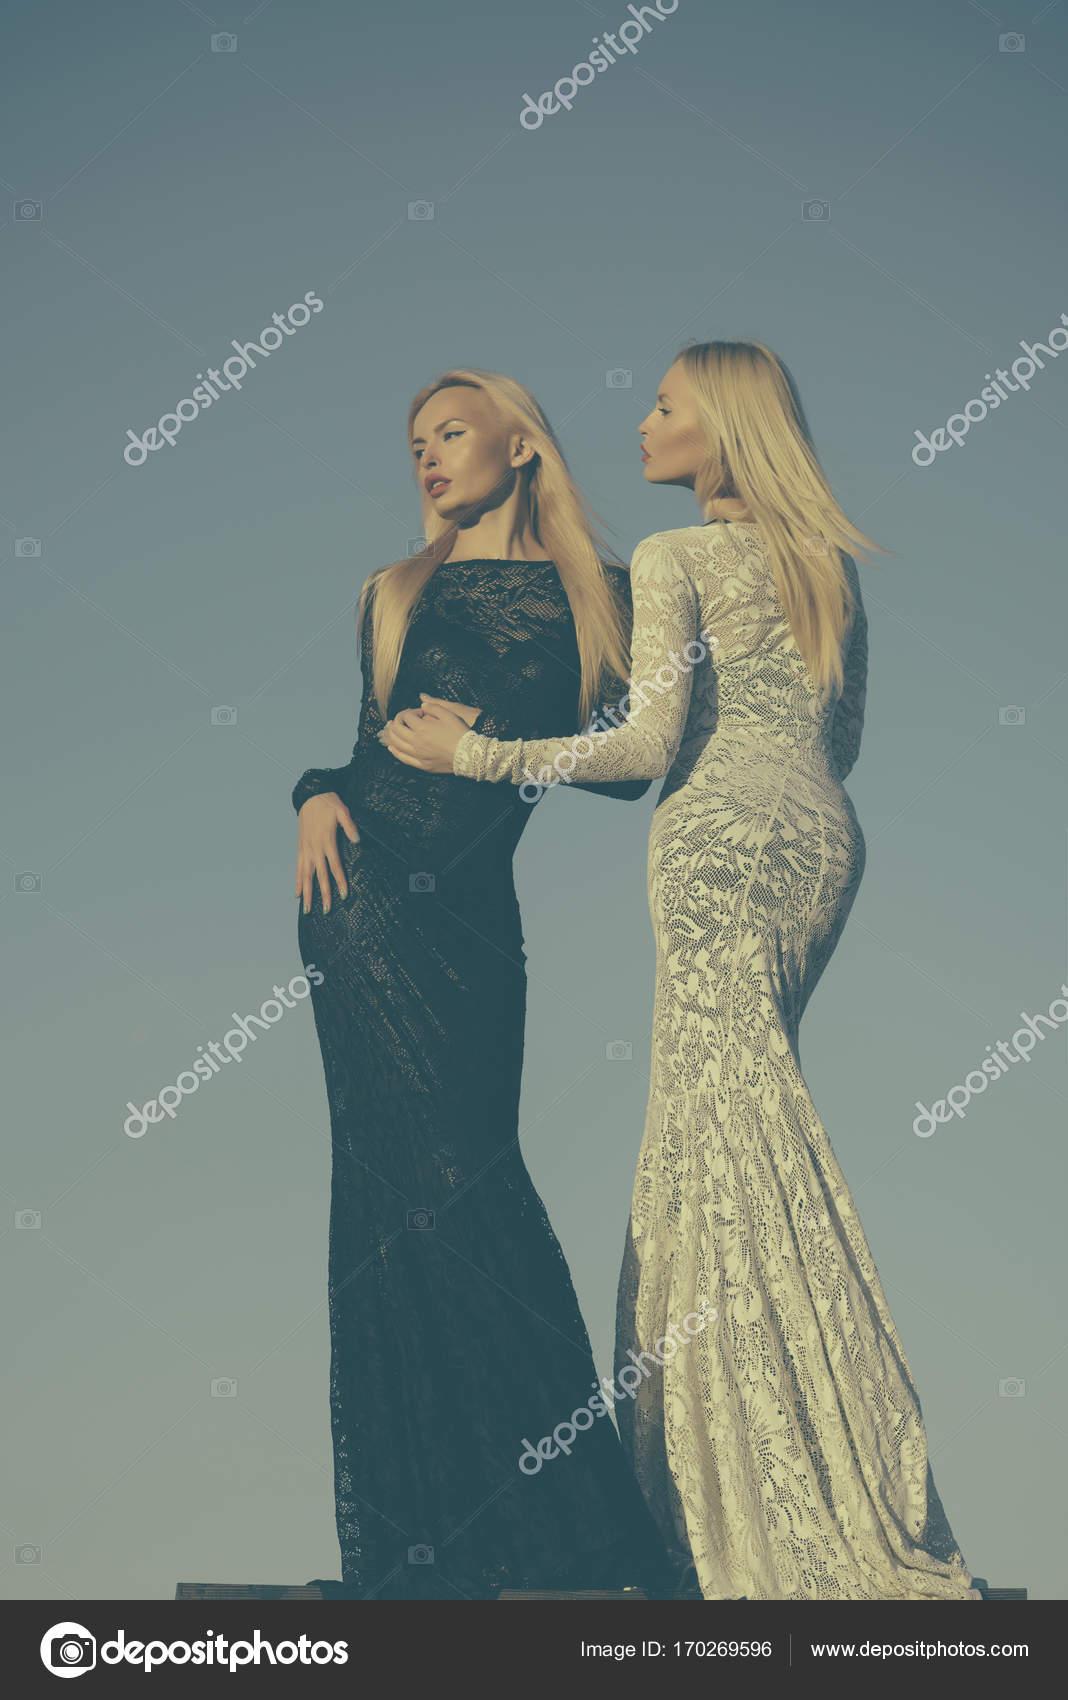 85707702b9f Γυναίκες που φορούν μαύρα και άσπρα φορέματα. Μόδα και ομορφιά. Απόφαση  επιλογής, και το μέλλον. Δύο κορίτσια με μακριά ξανθά μαλλιά ποζάρει στο  γκρίζο ...